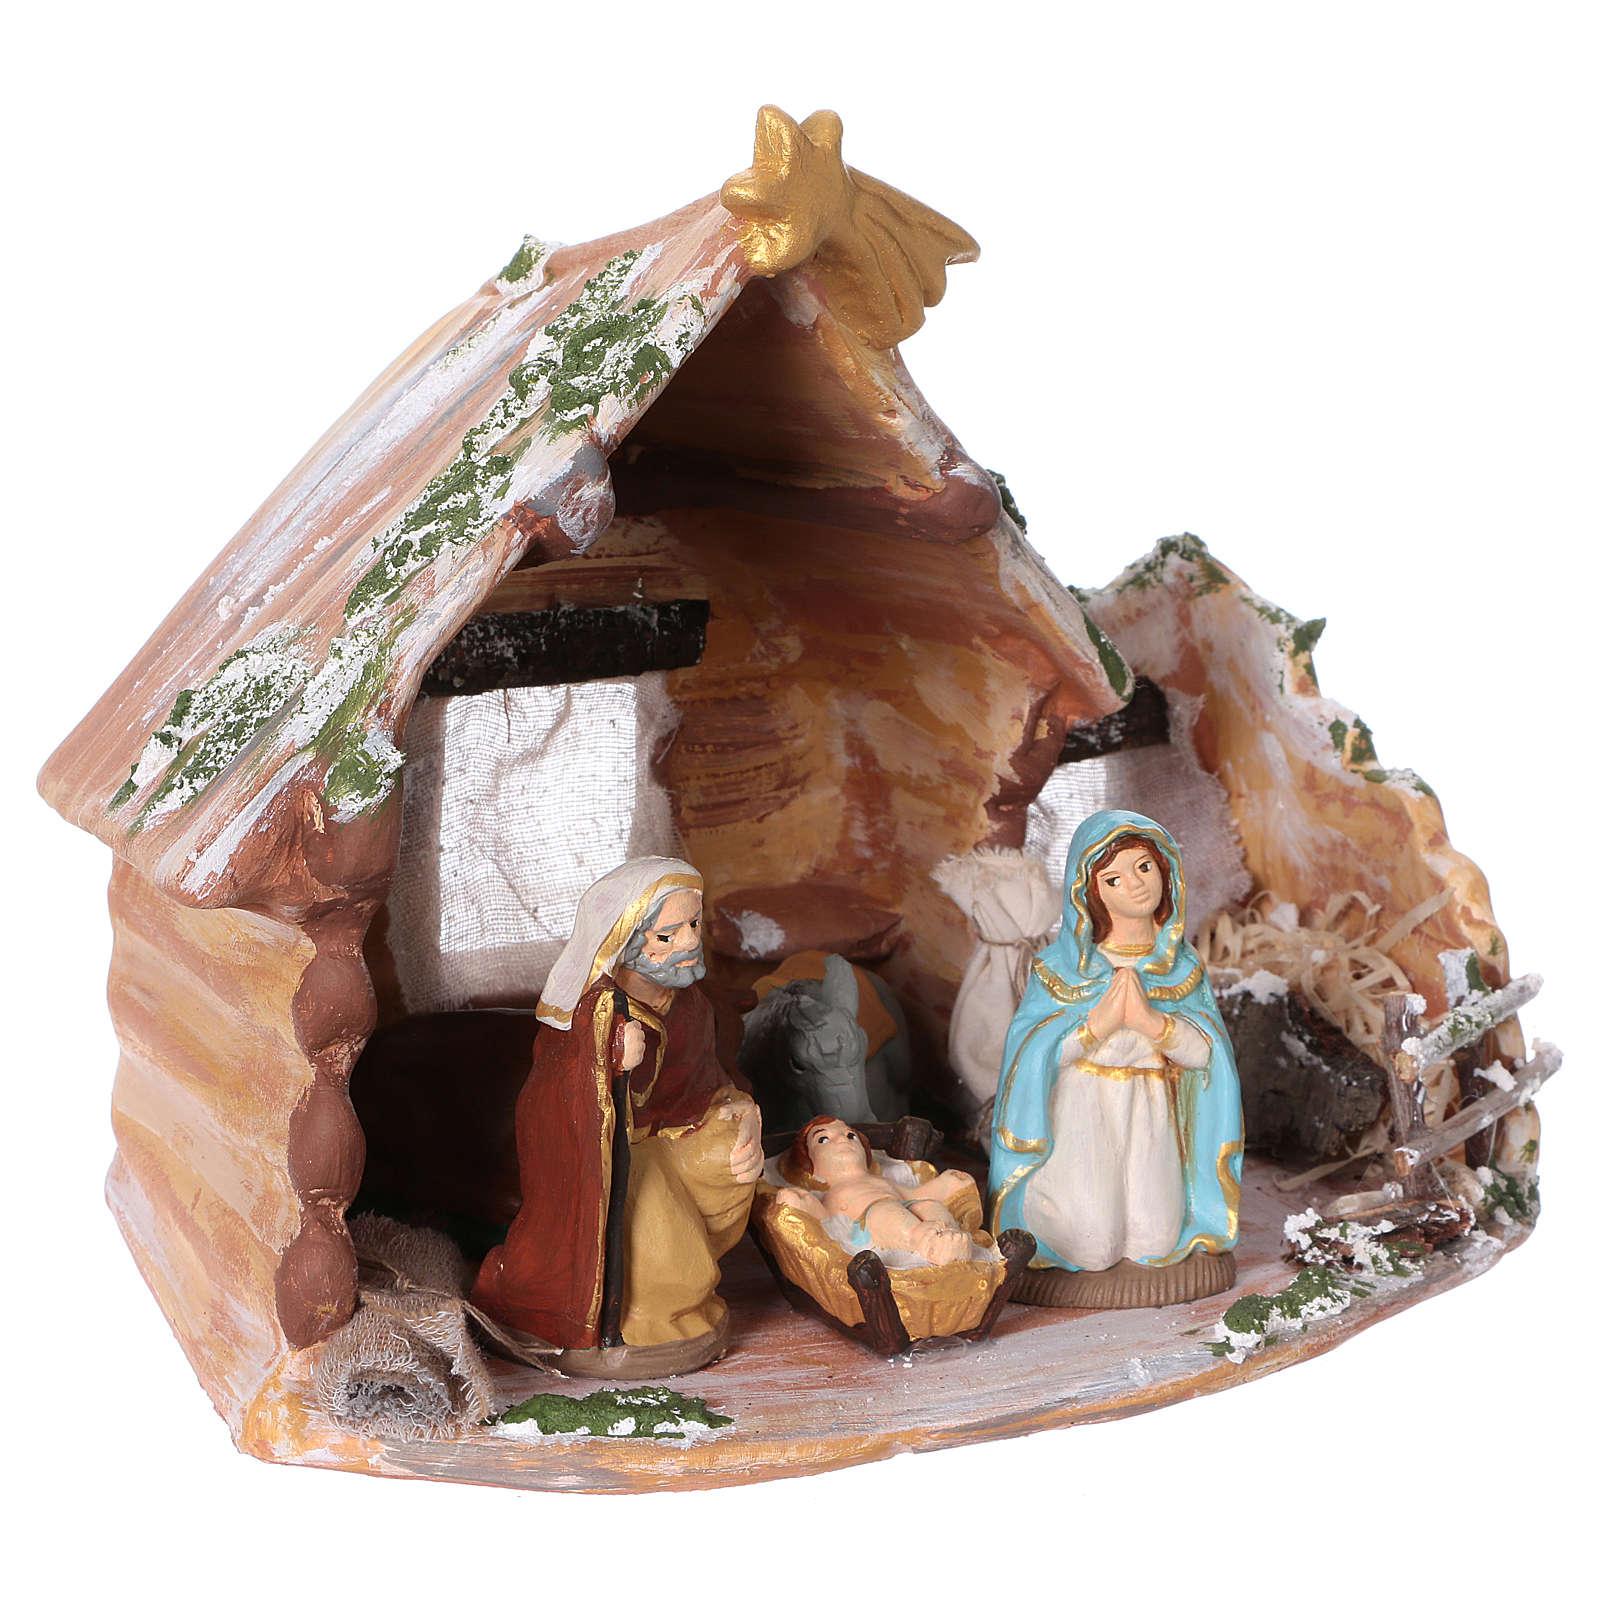 Coloured terracotta hut with 8 cm Nativity scene and comet made in Deruta 4